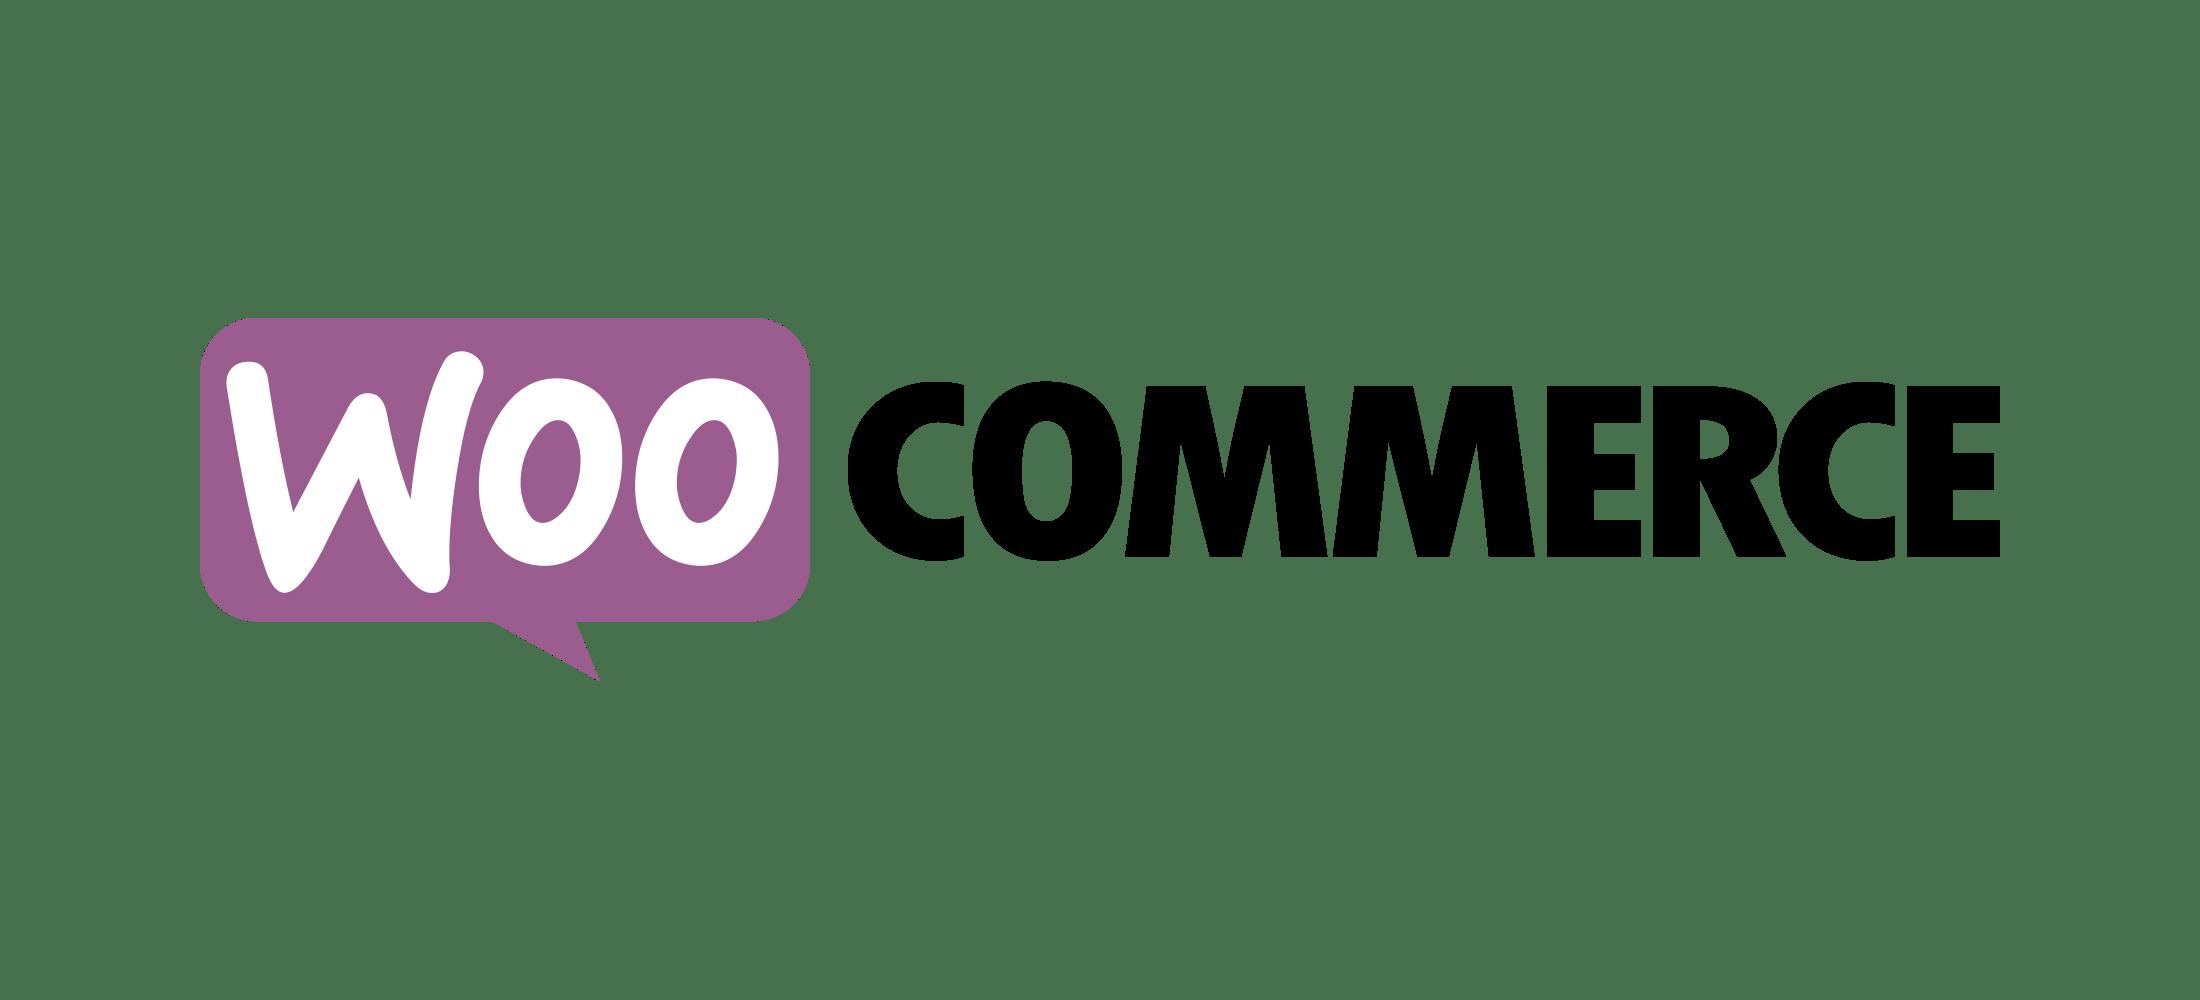 Woocommerce logo 1